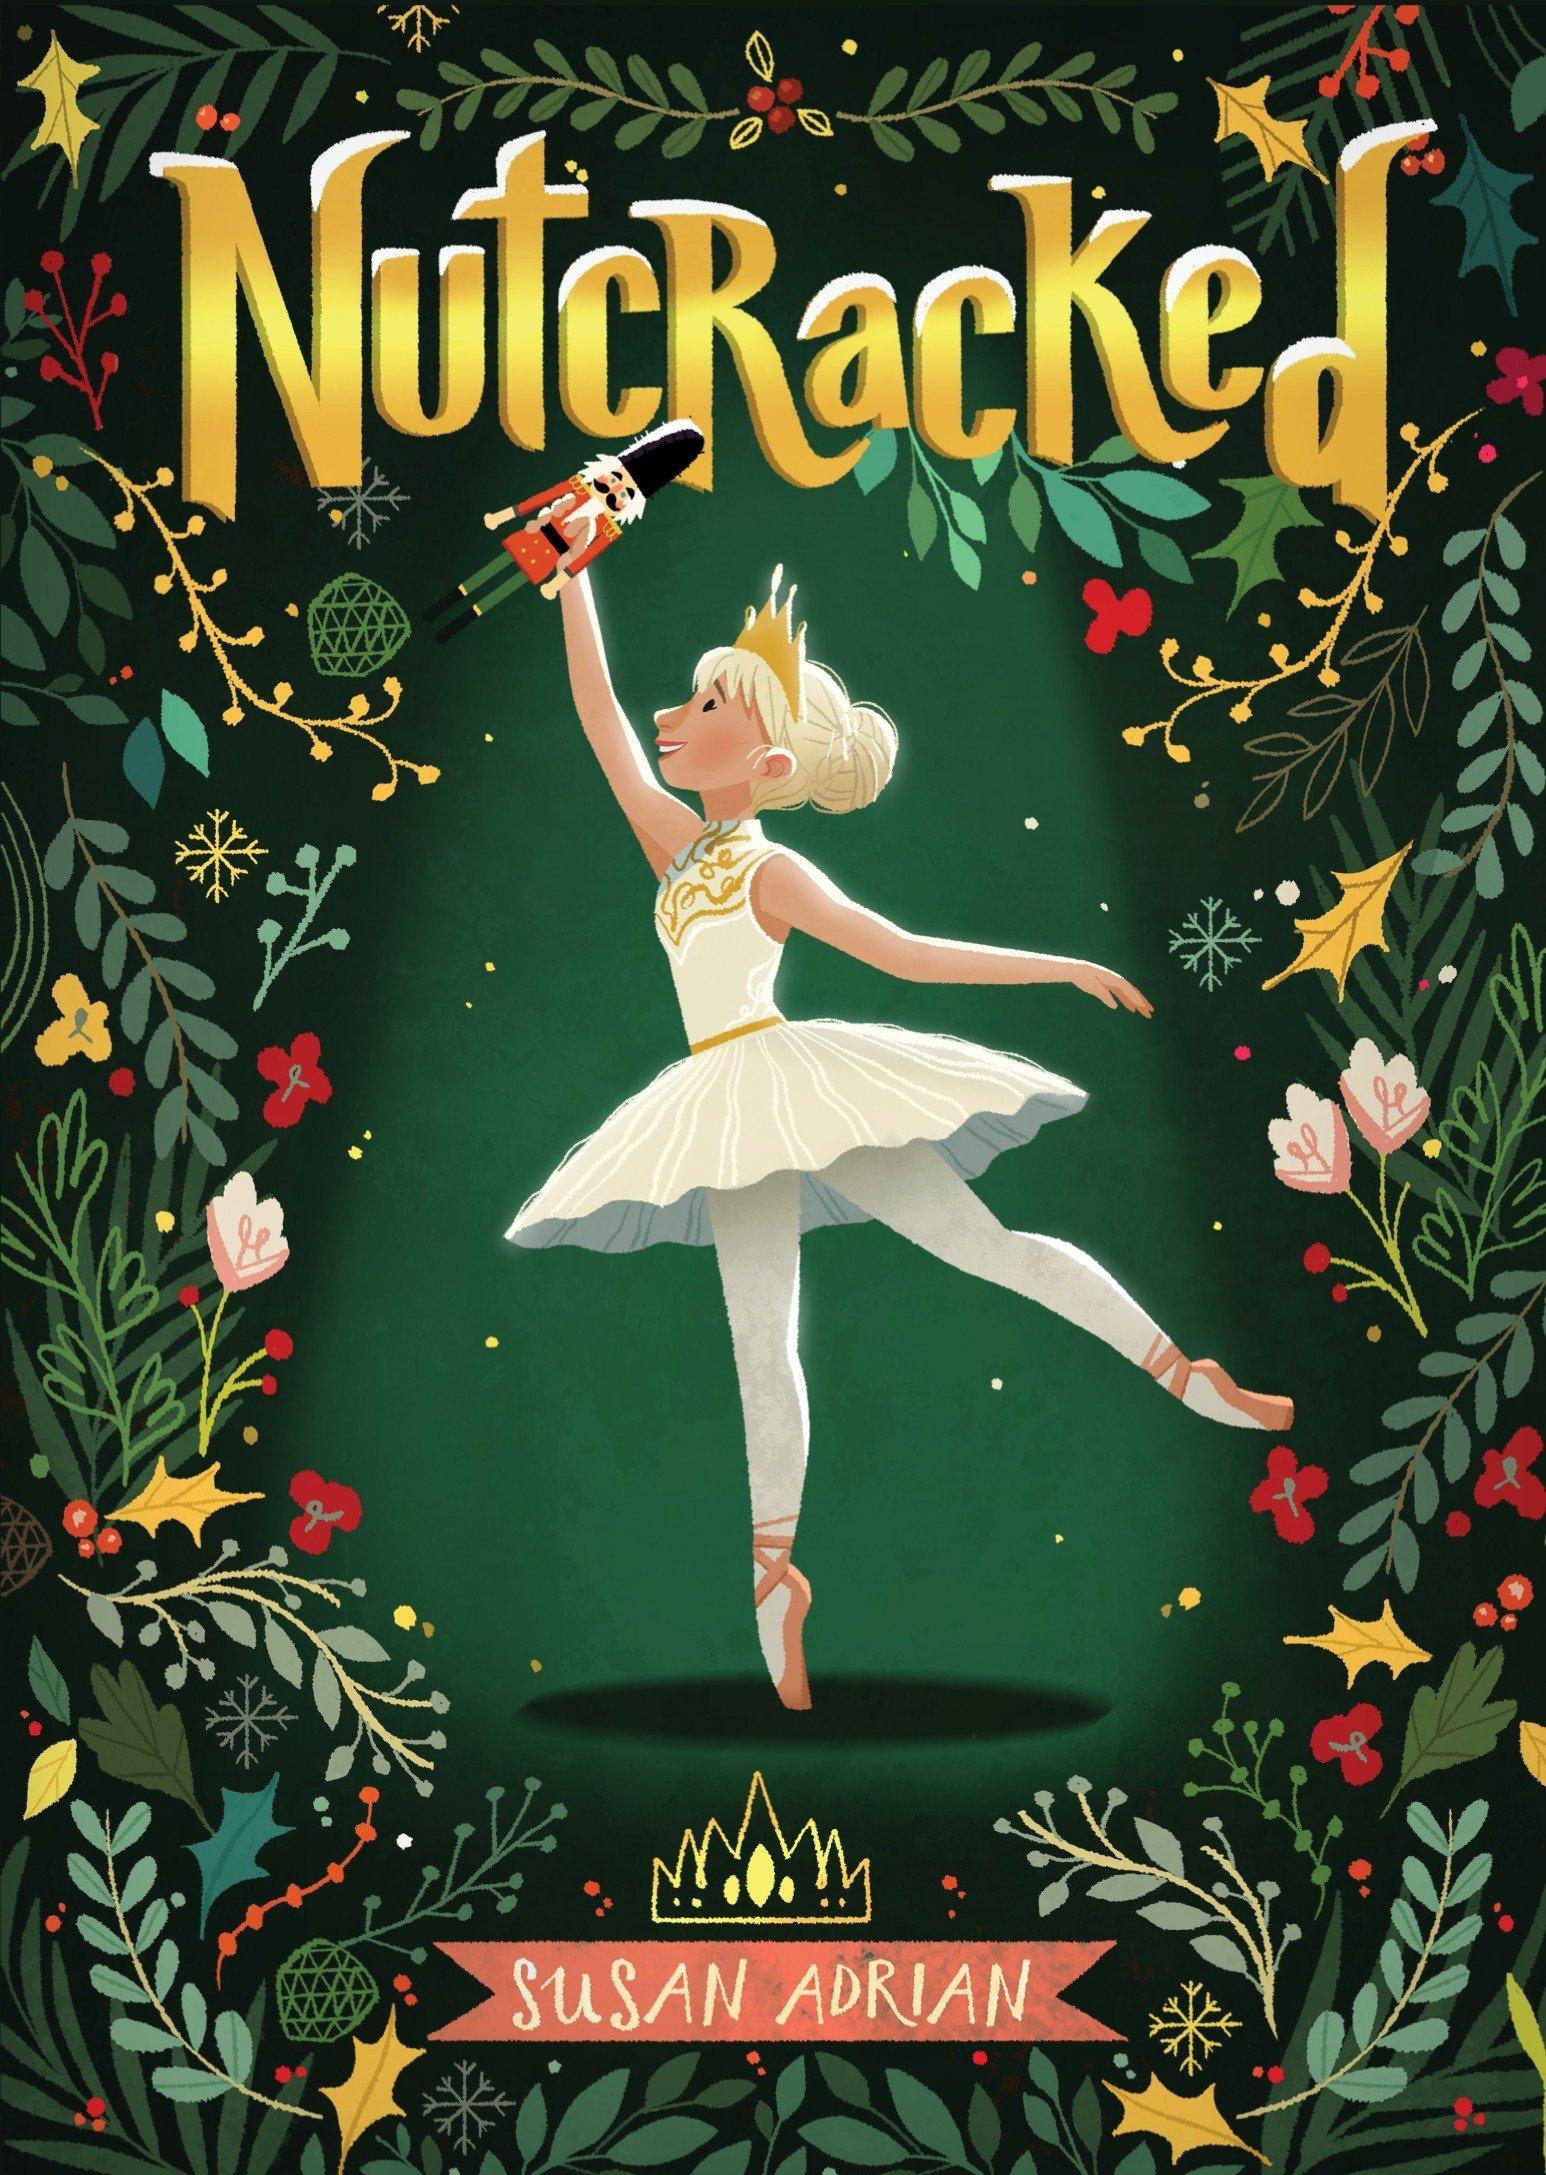 Nutcracked: Adrian, Susan: 9780399556685: Amazon.com: Books